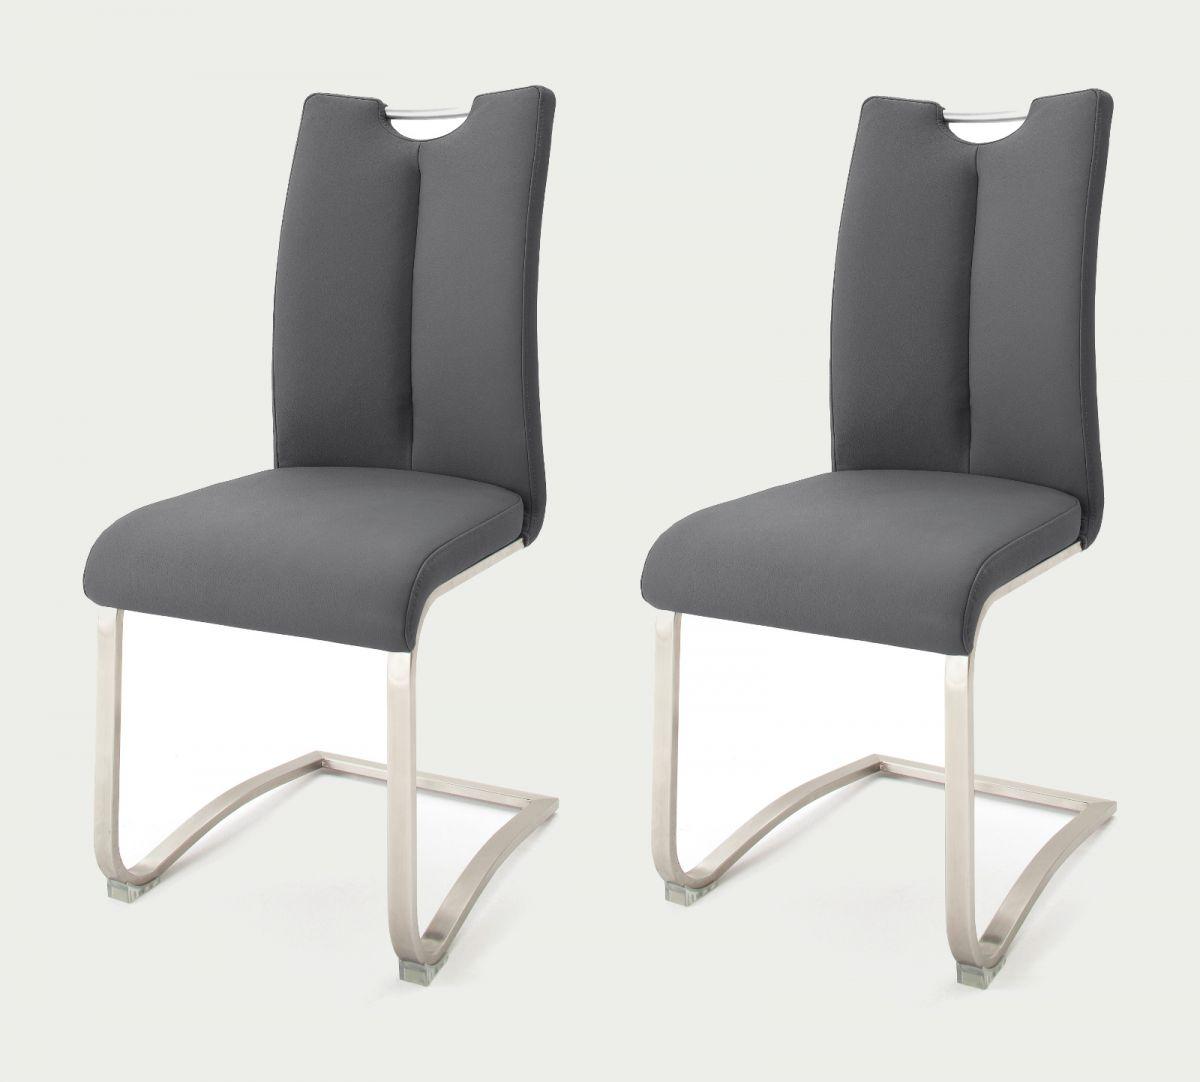 2 x Stuhl Artos Grau Schwinger Leder